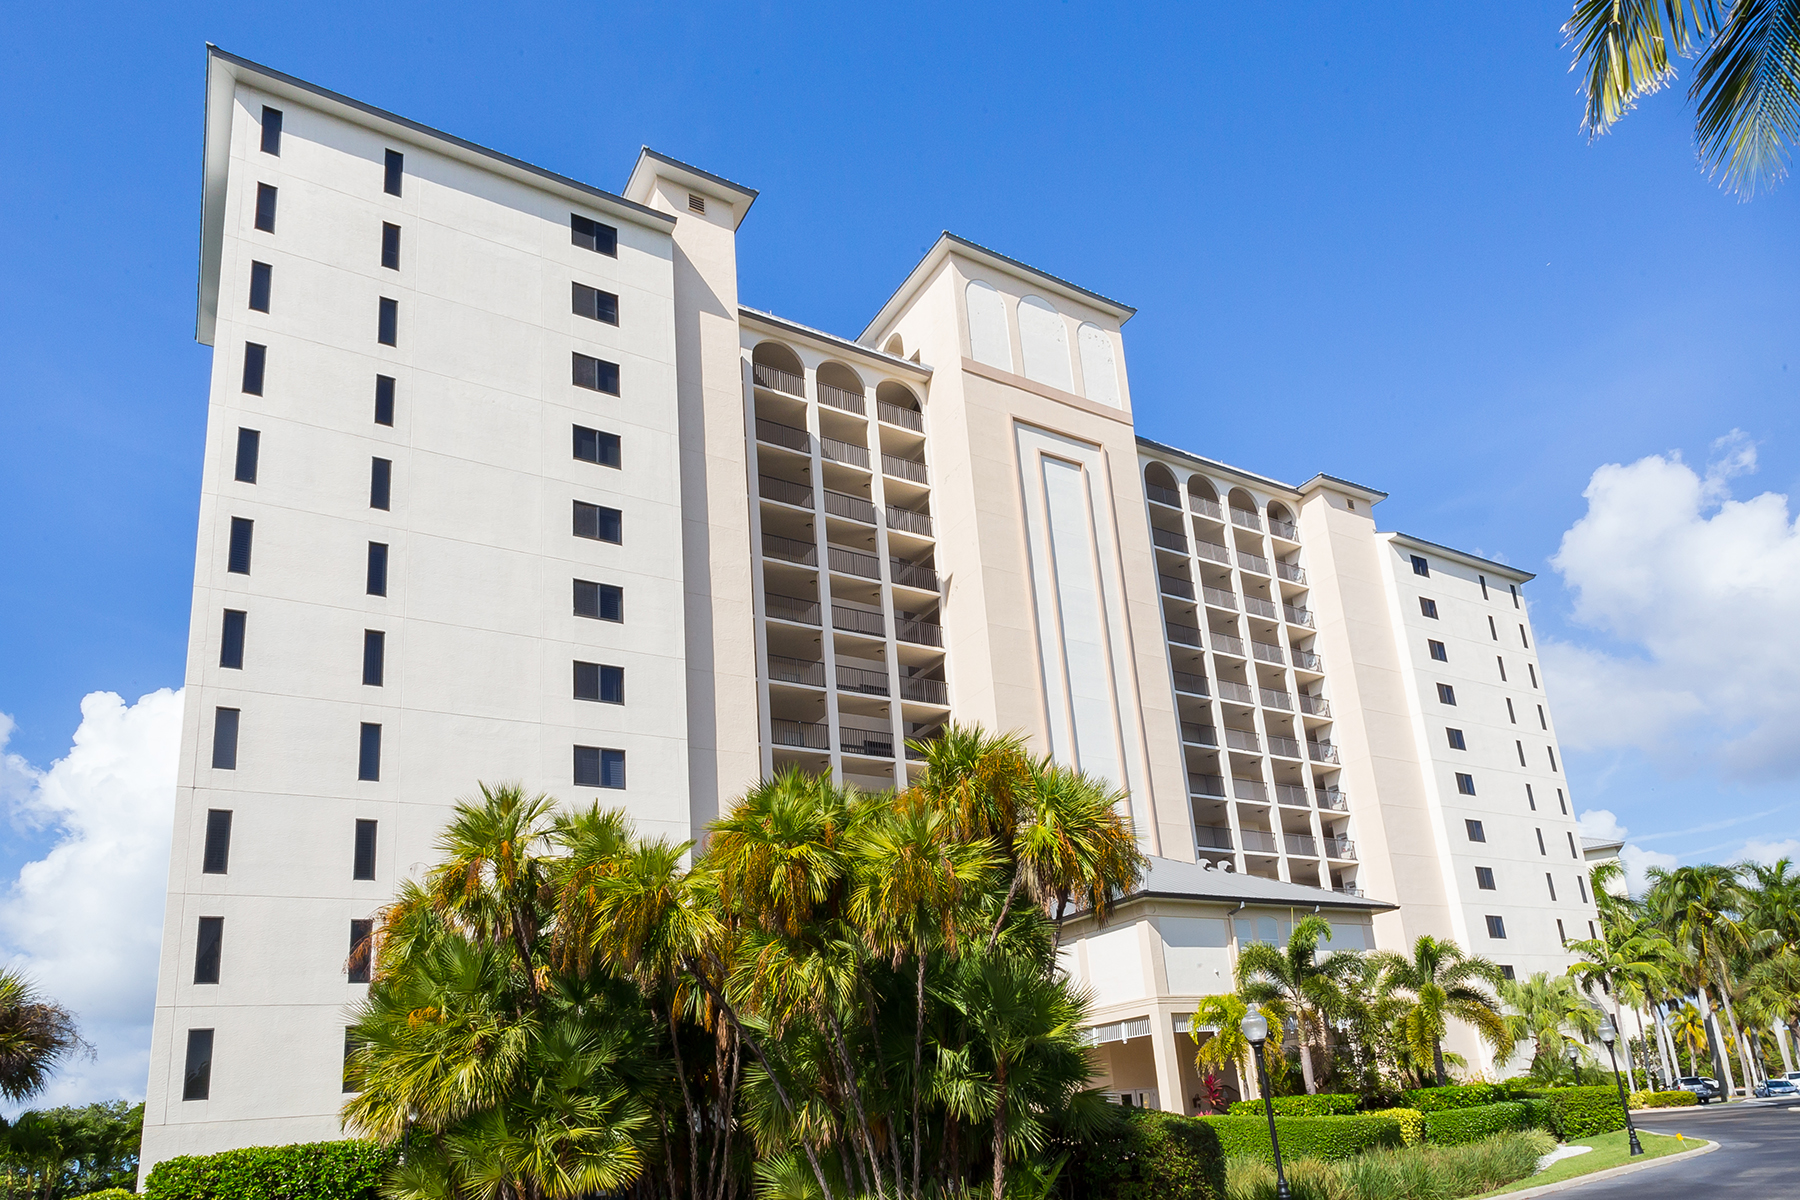 Condominio per Vendita alle ore FORT MYERS 17170 Harbour Point Dr 435 Fort Myers, Florida, 33908 Stati Uniti